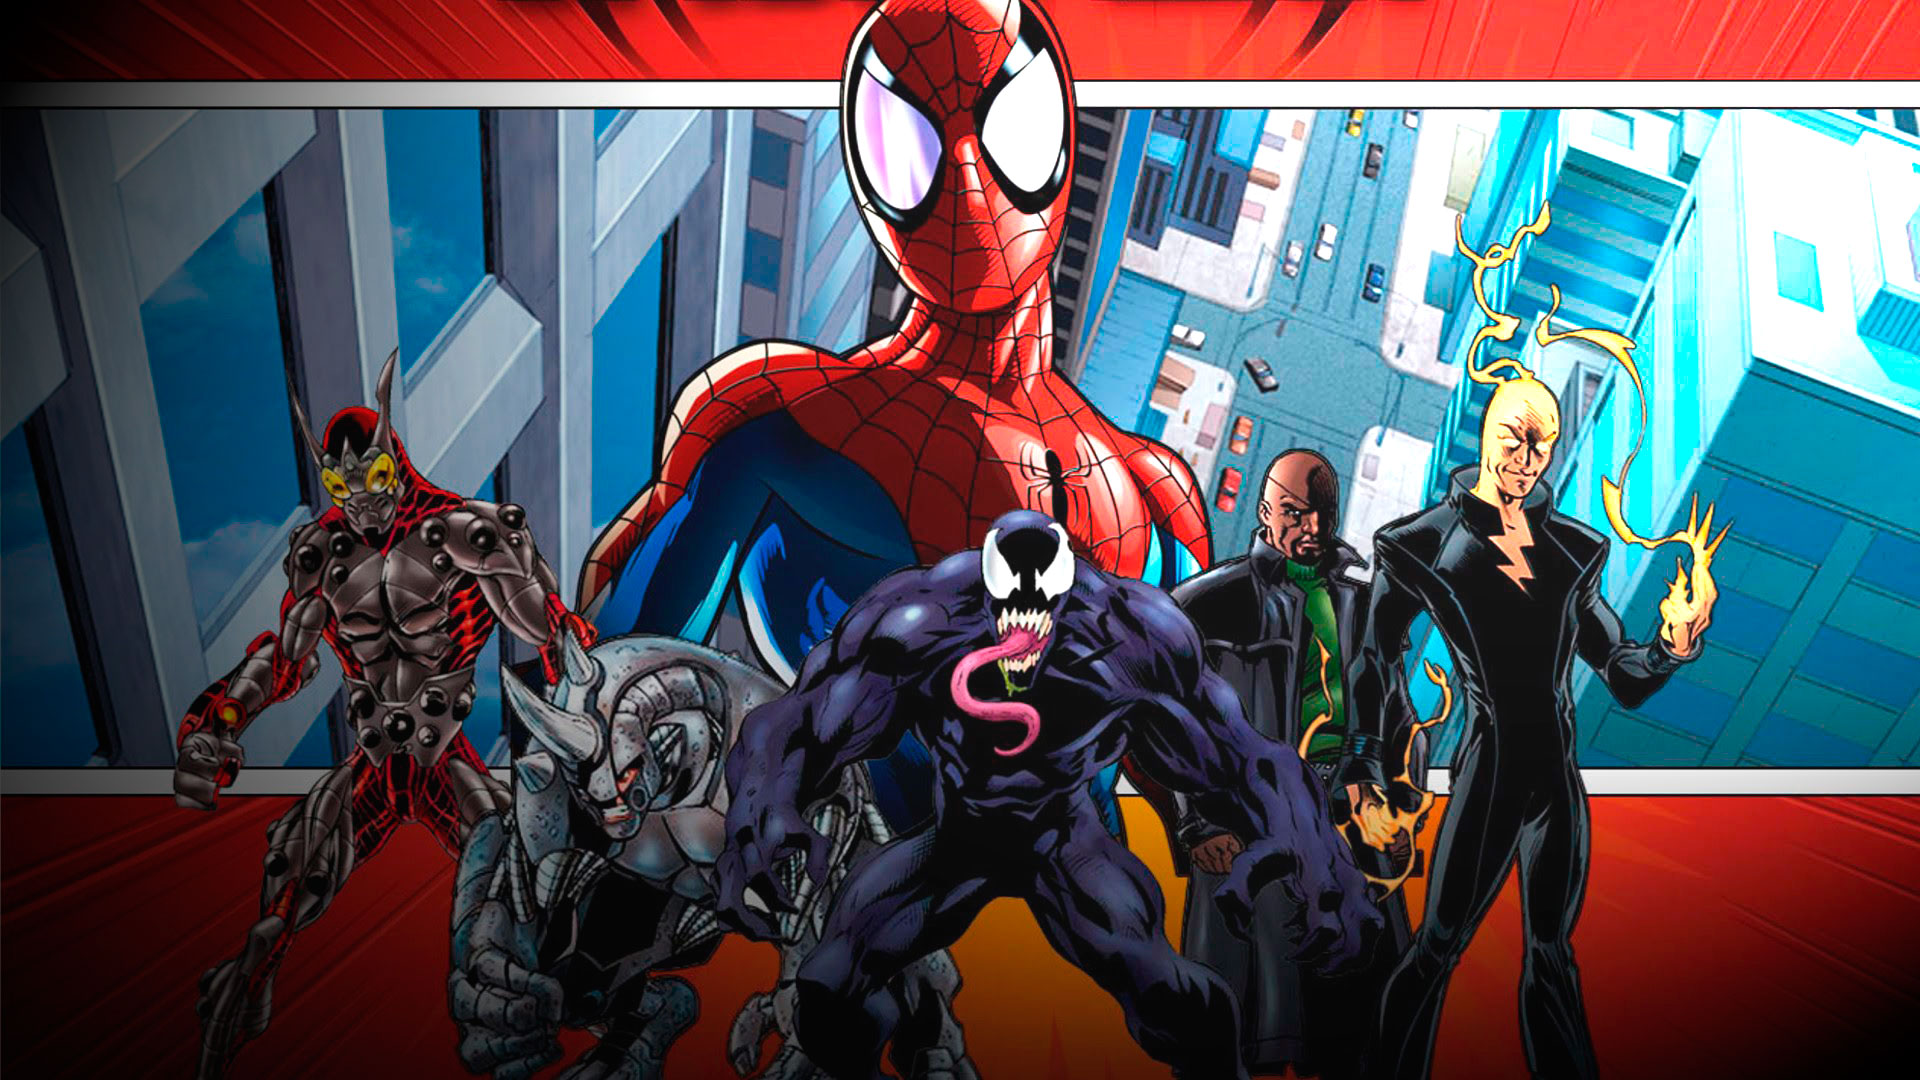 Spider Man 3 Wallpaper Download Skachat Ultimate Spider Man